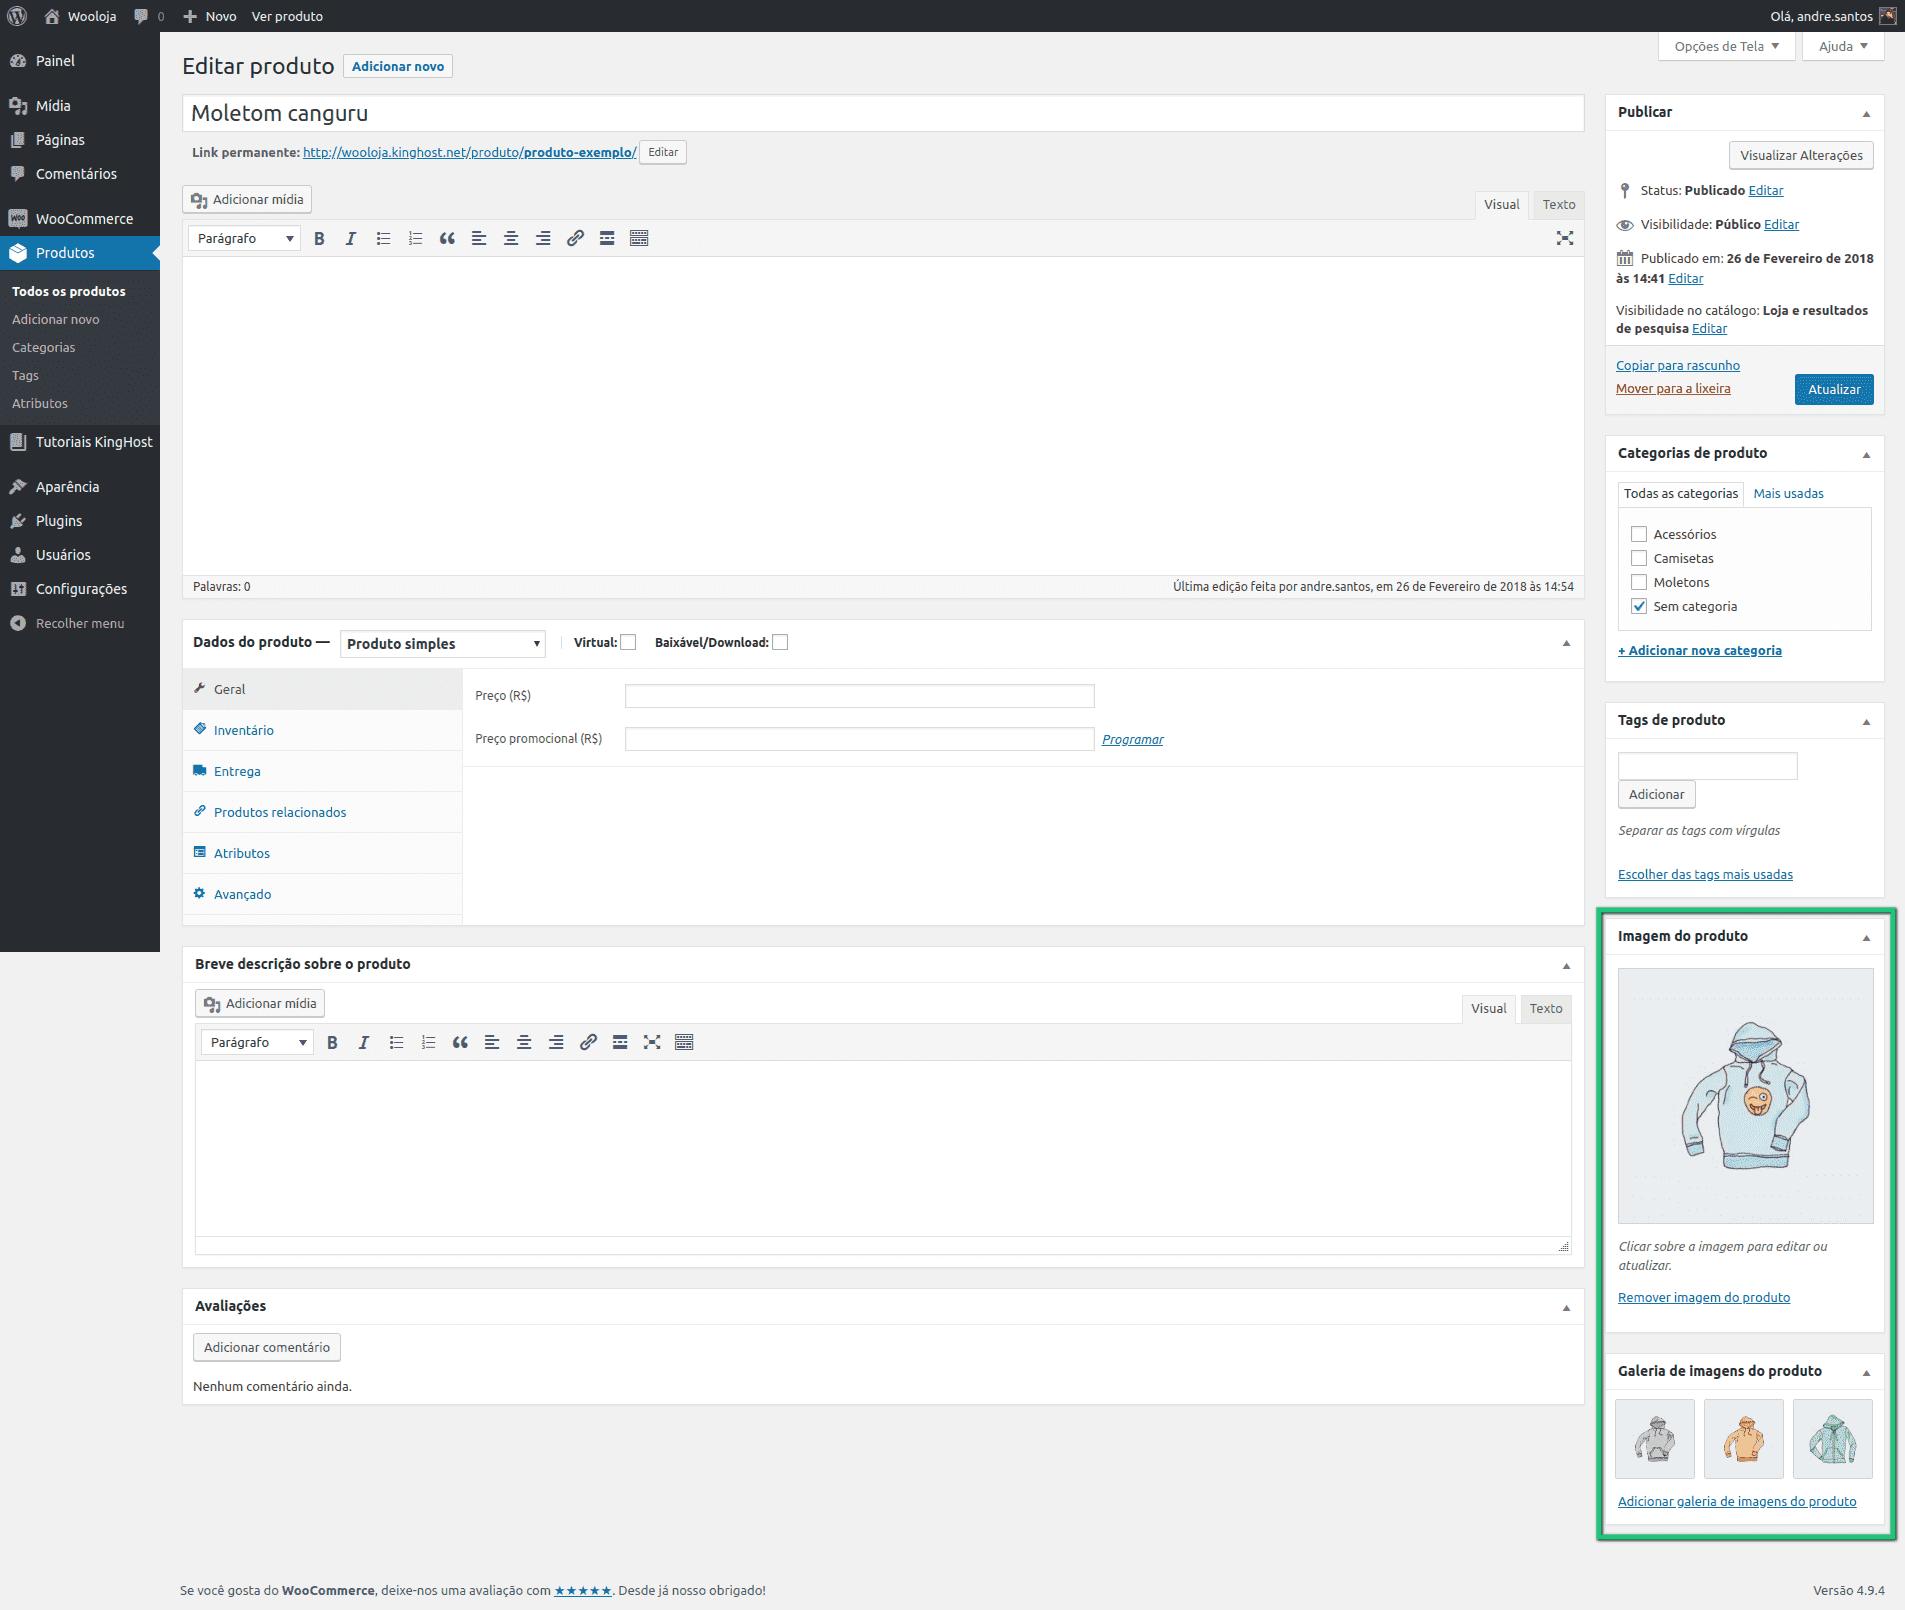 WooCommerce - Imagens do produto